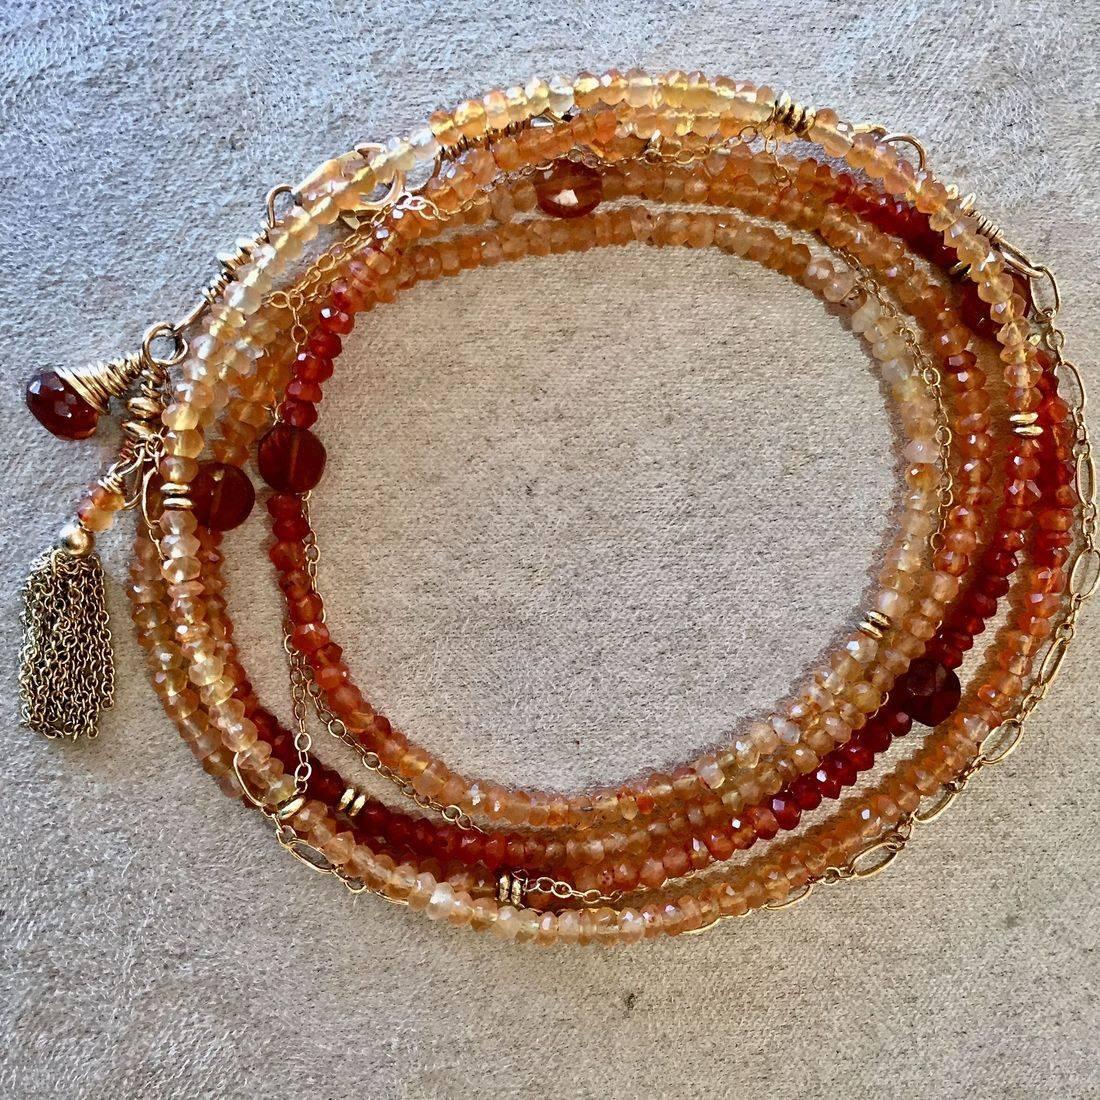 "42"" Carnelian Gemstone Wrap Bracelet, 14k Gold chain, clasp, tassel, can be worn as a necklace"